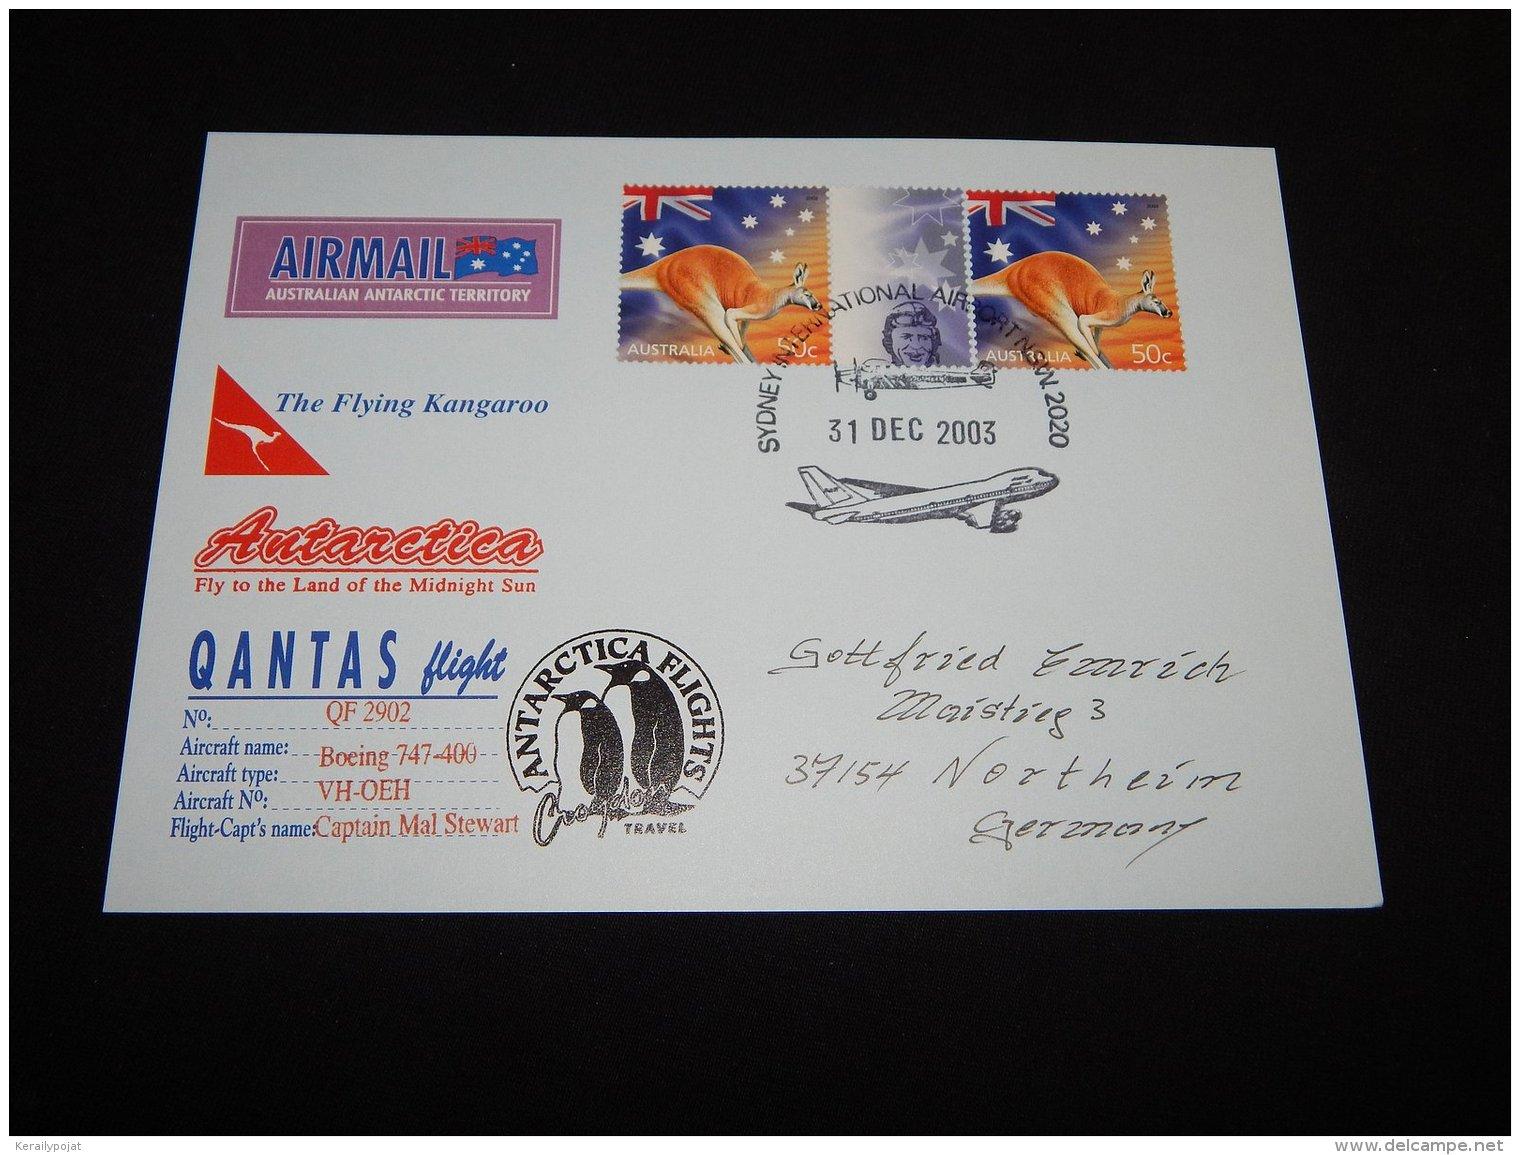 Australia 2003 The Flying Kangaroo Card__(L-23335) - Covers & Documents